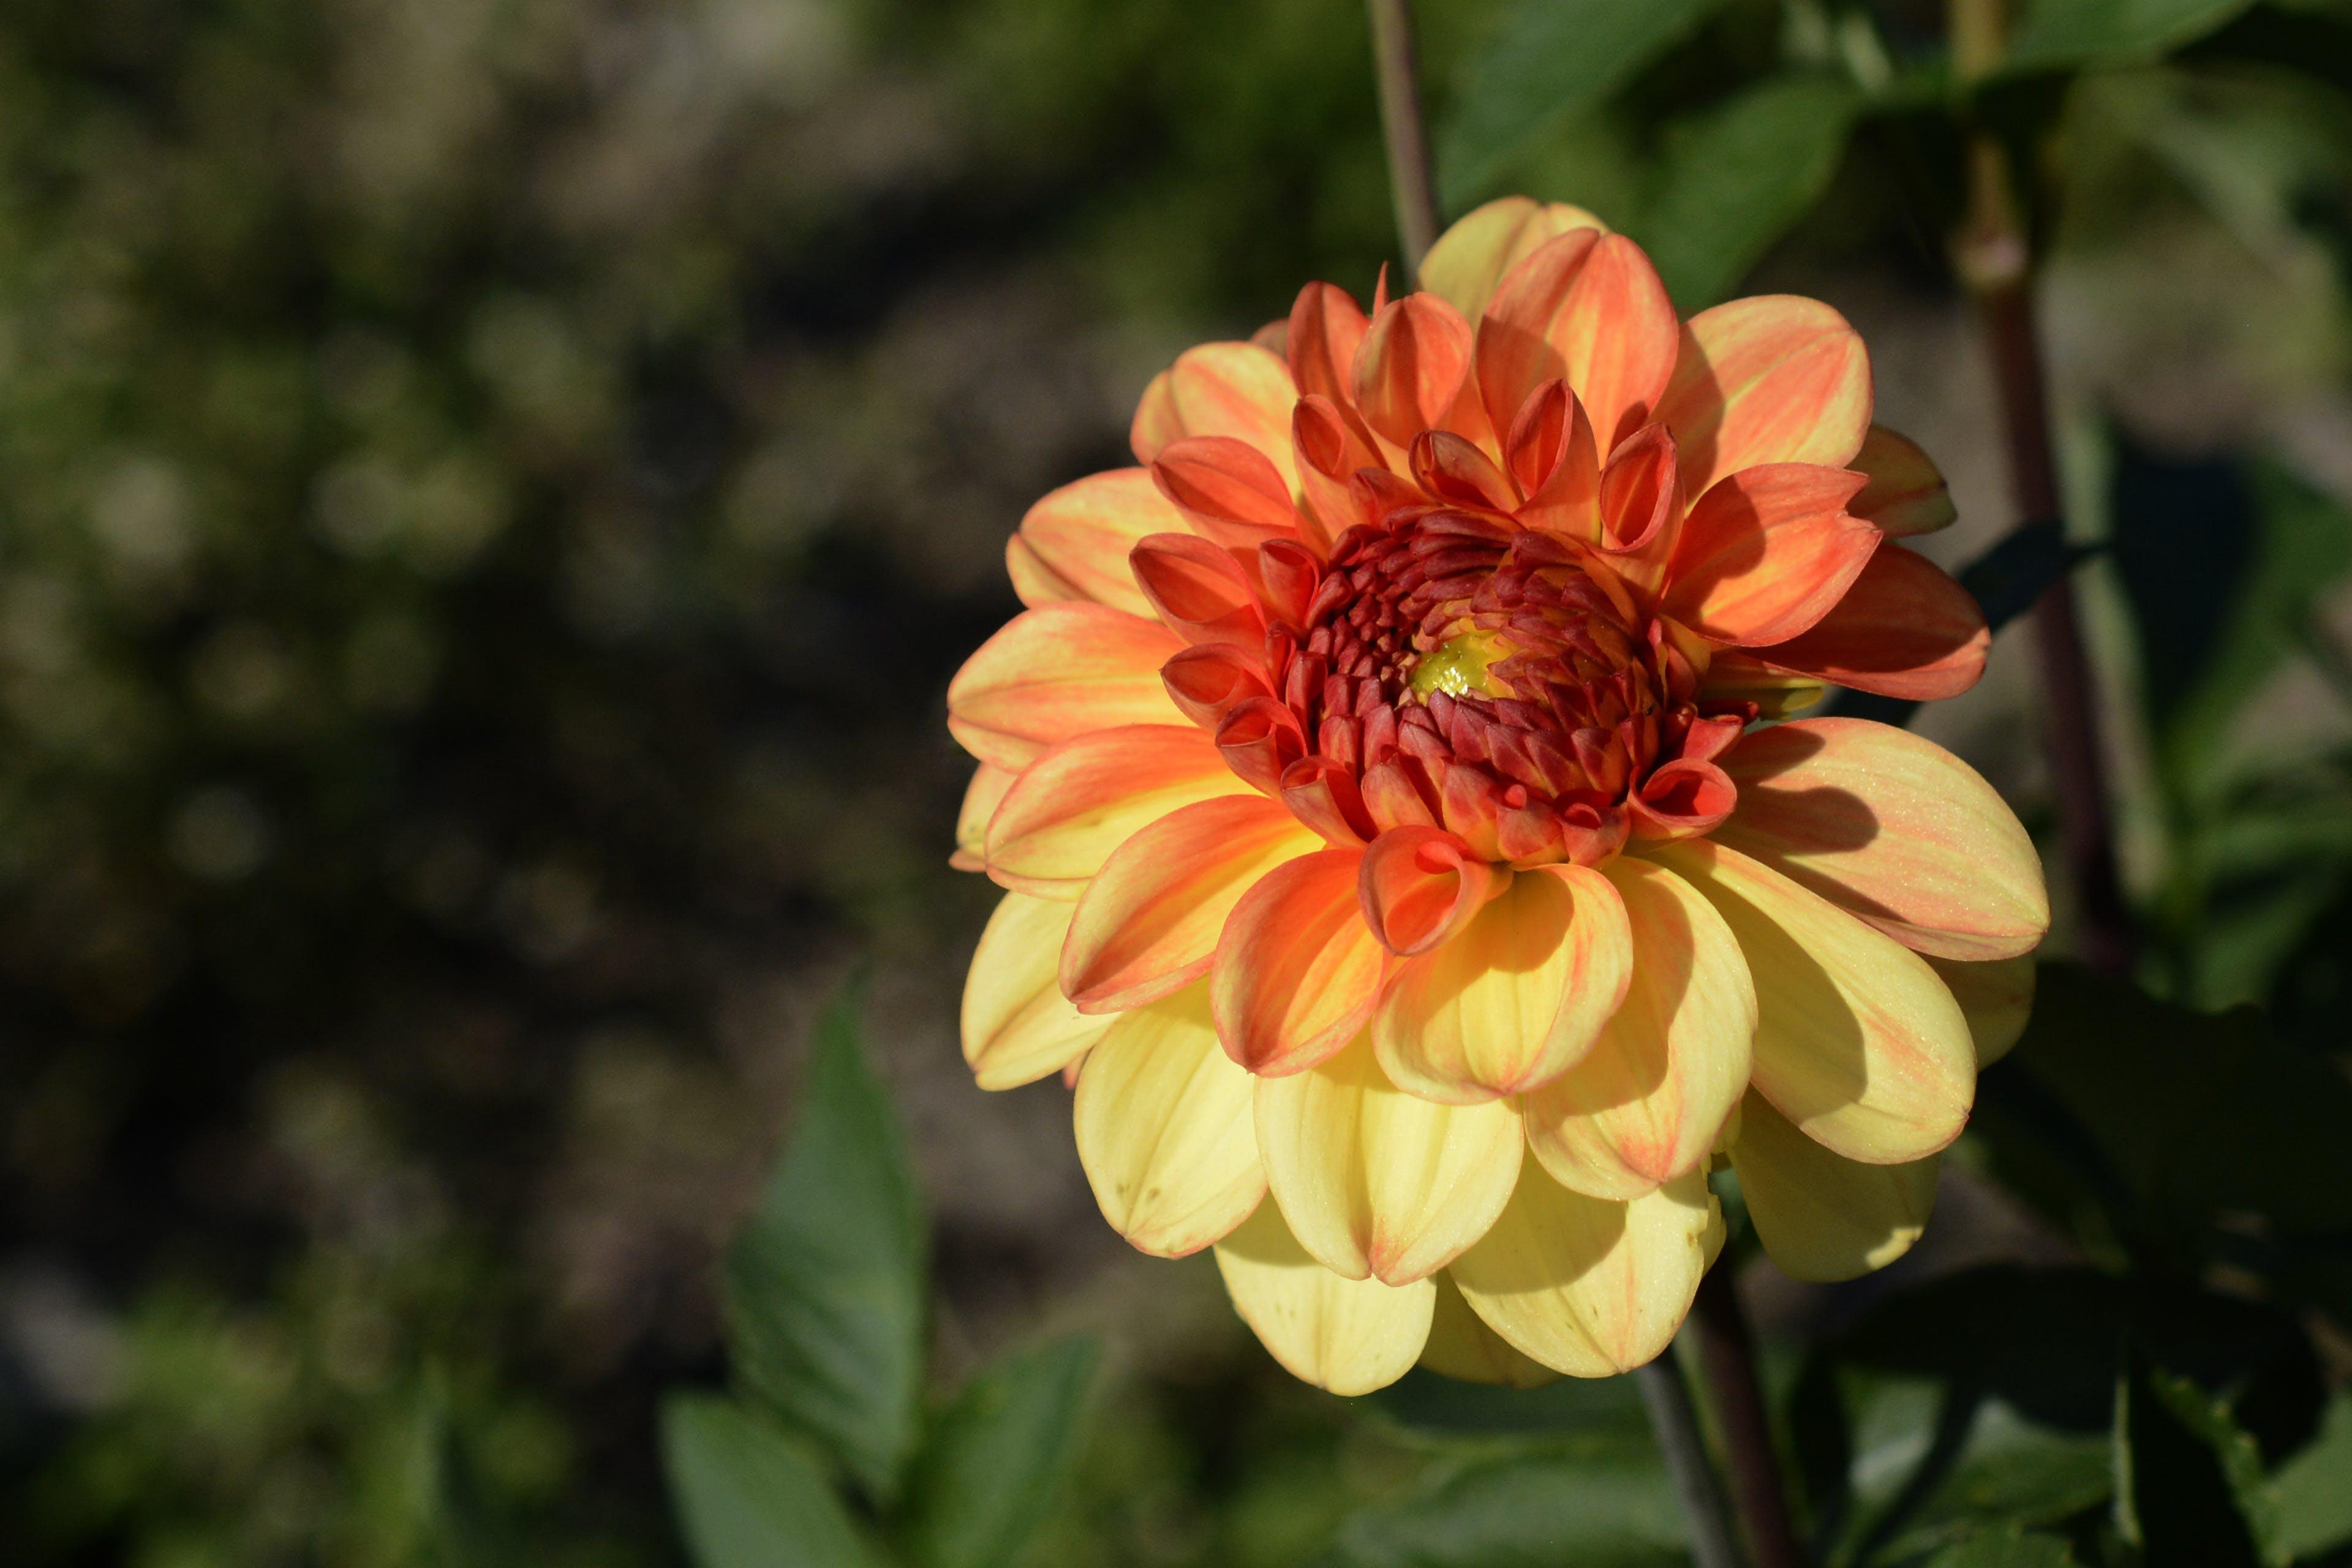 Free stock photo of nature, flowers, garden, yellow